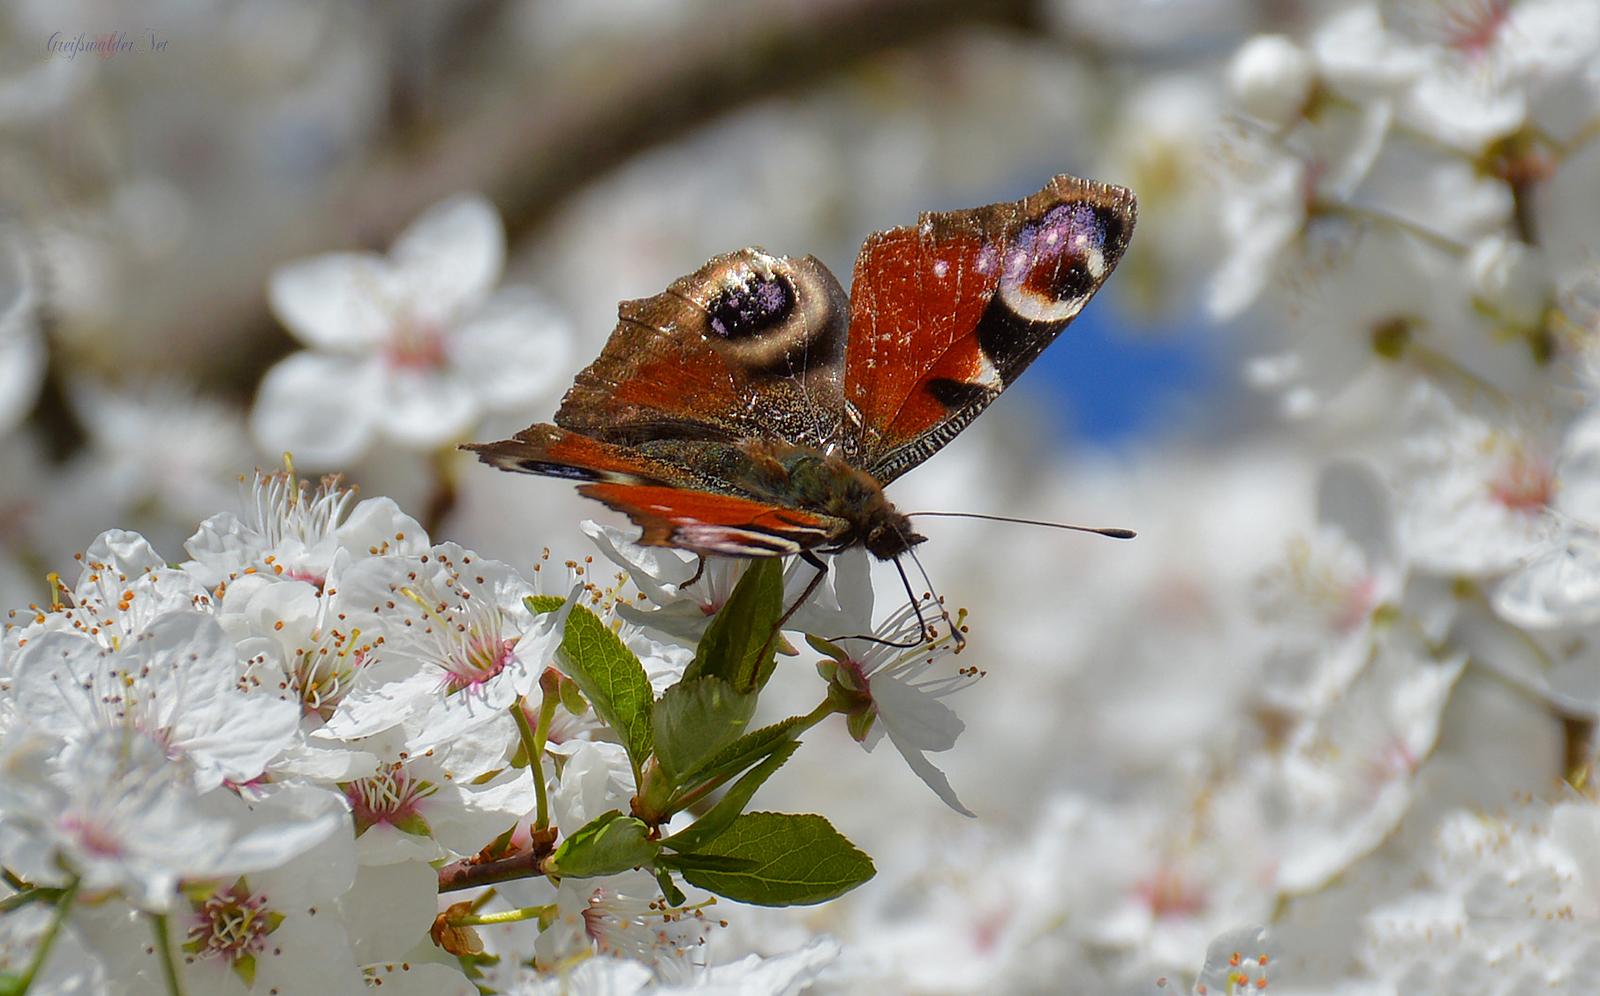 Schmetterling - Tagpfauenauge (Aglais io)